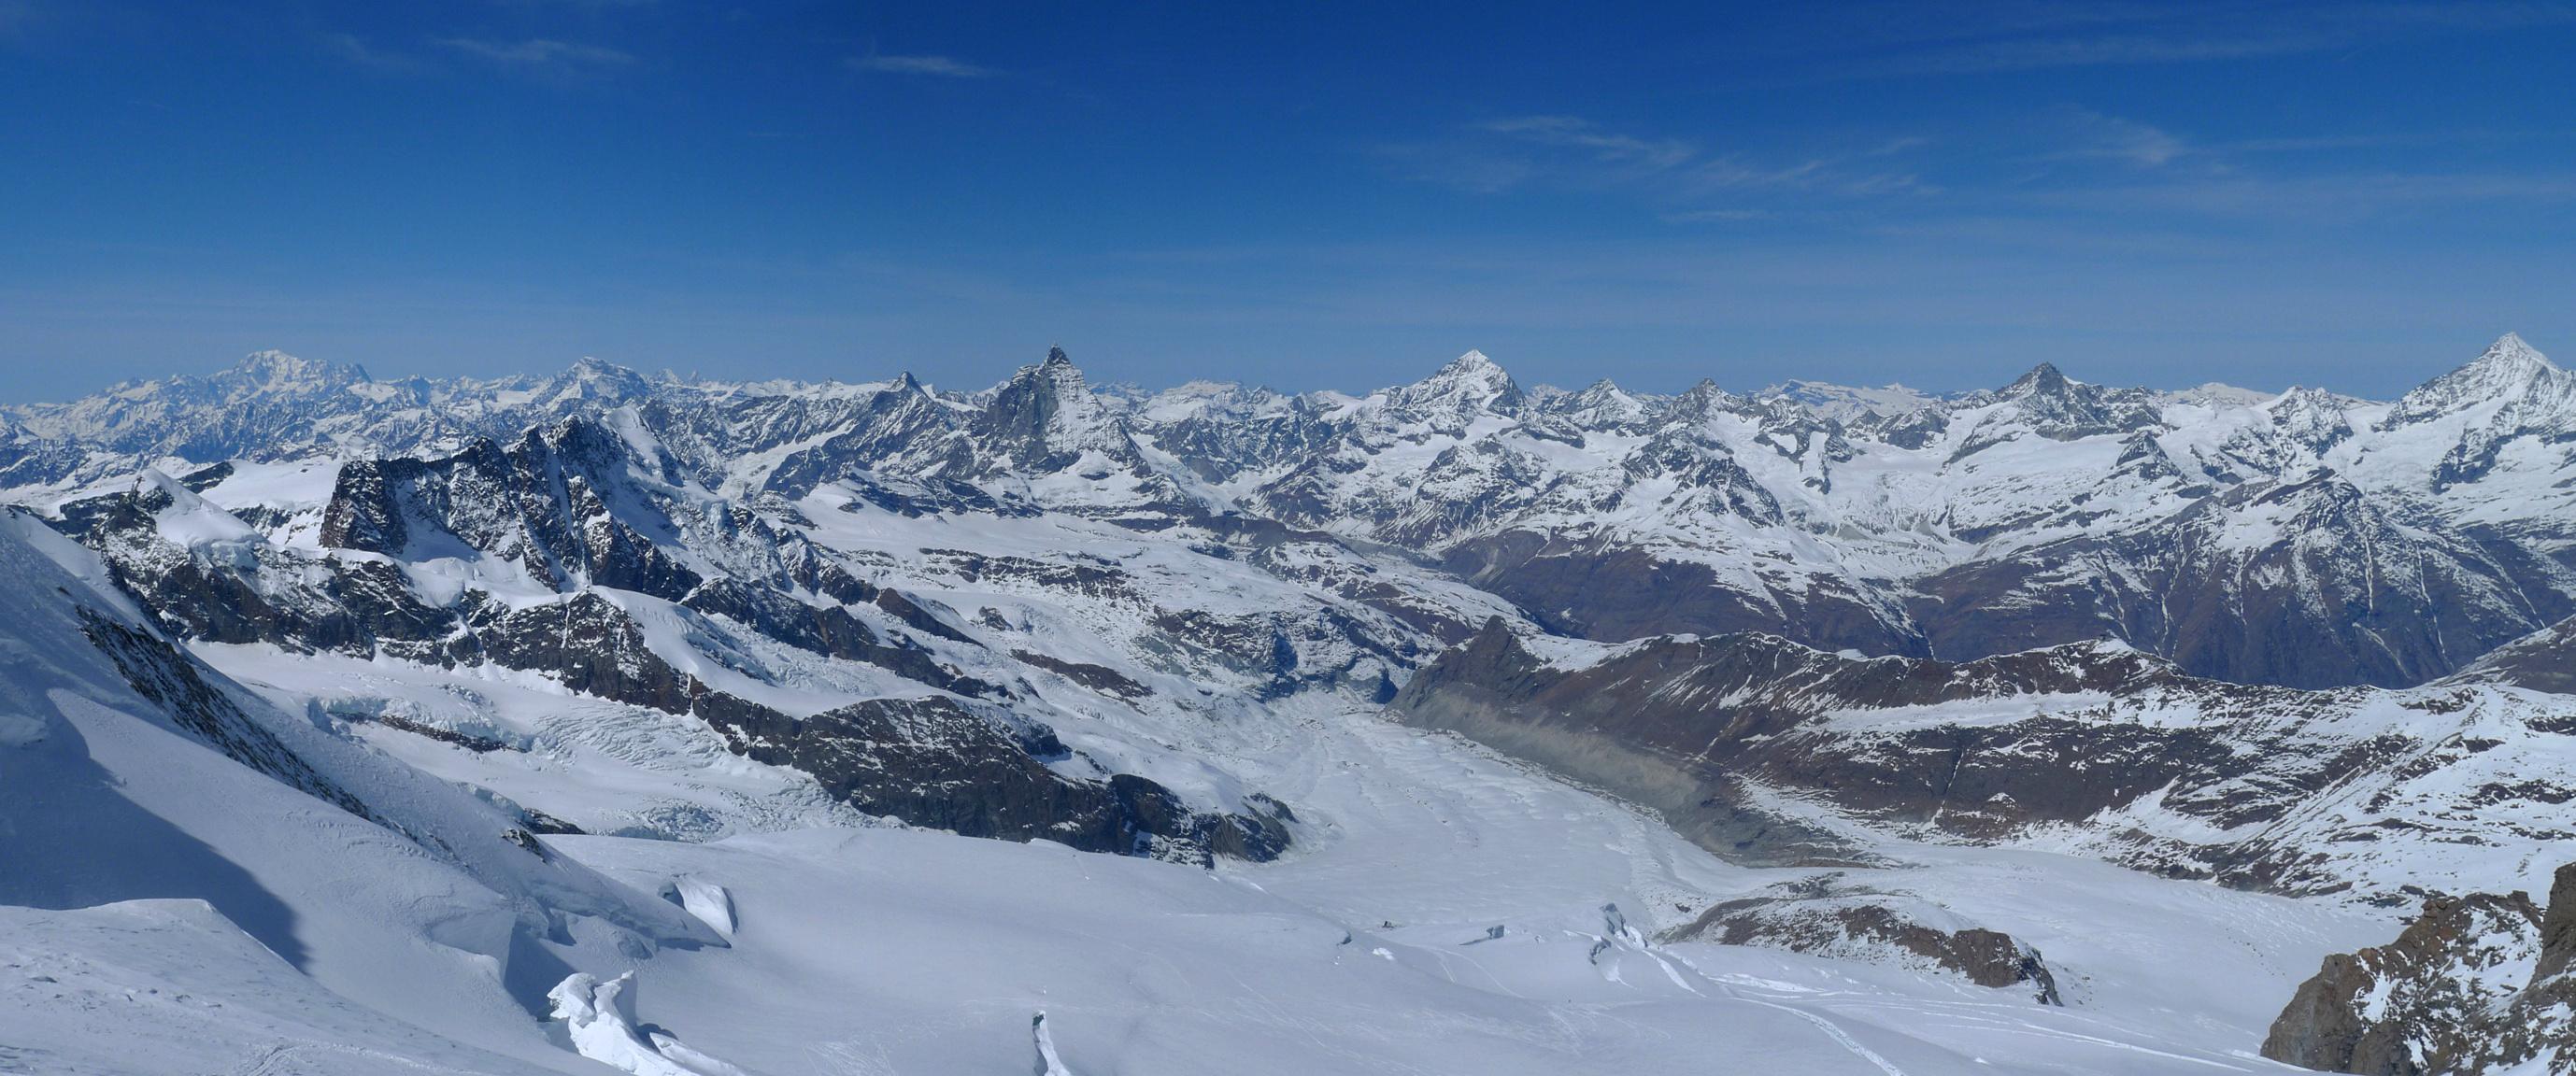 Dufourspitze / Punta Dufour - Monte Rosa Walliser Alpen / Alpes valaisannes Švýcarsko panorama 04